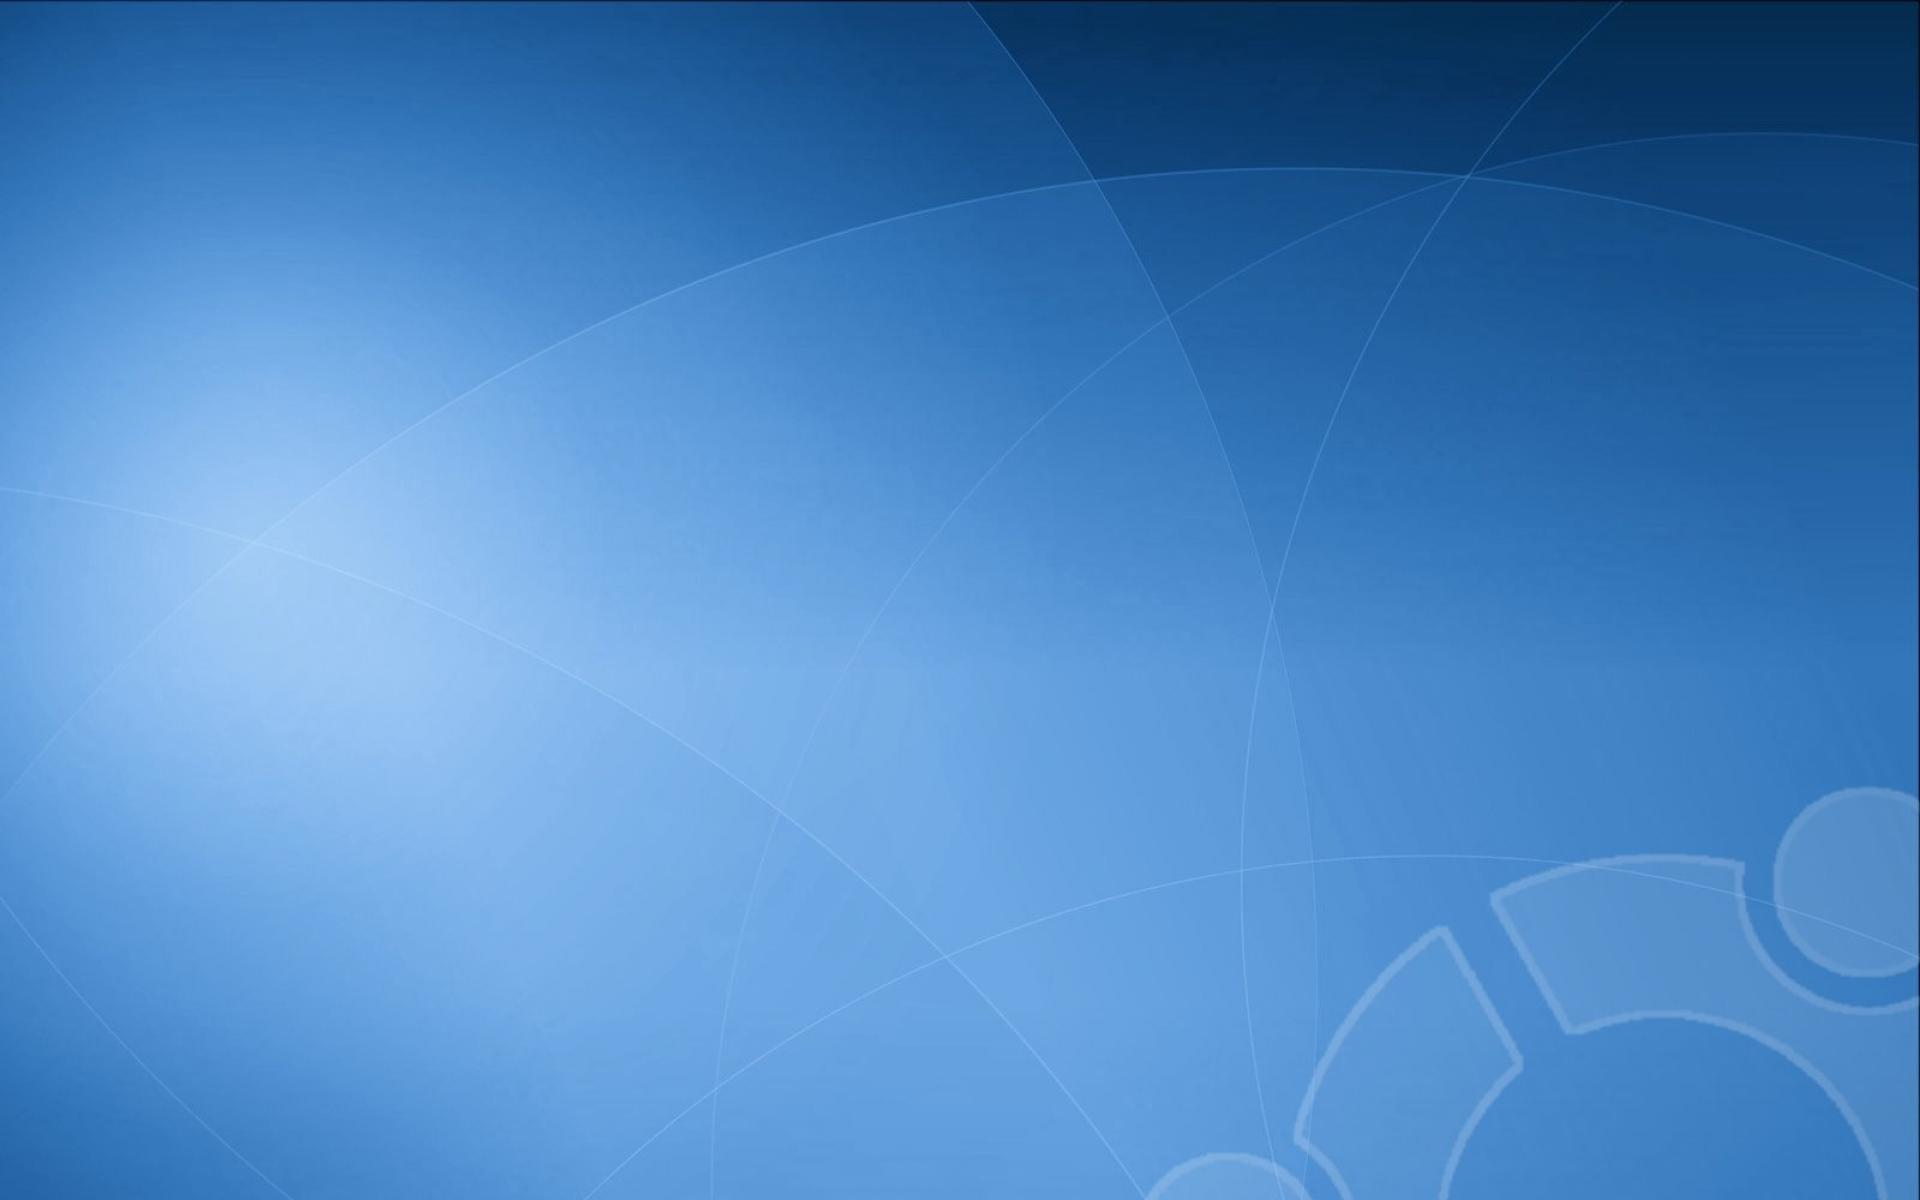 linux ubuntu 1600x1200 wallpaper Wallpaper Wallpapers Download 1920x1200